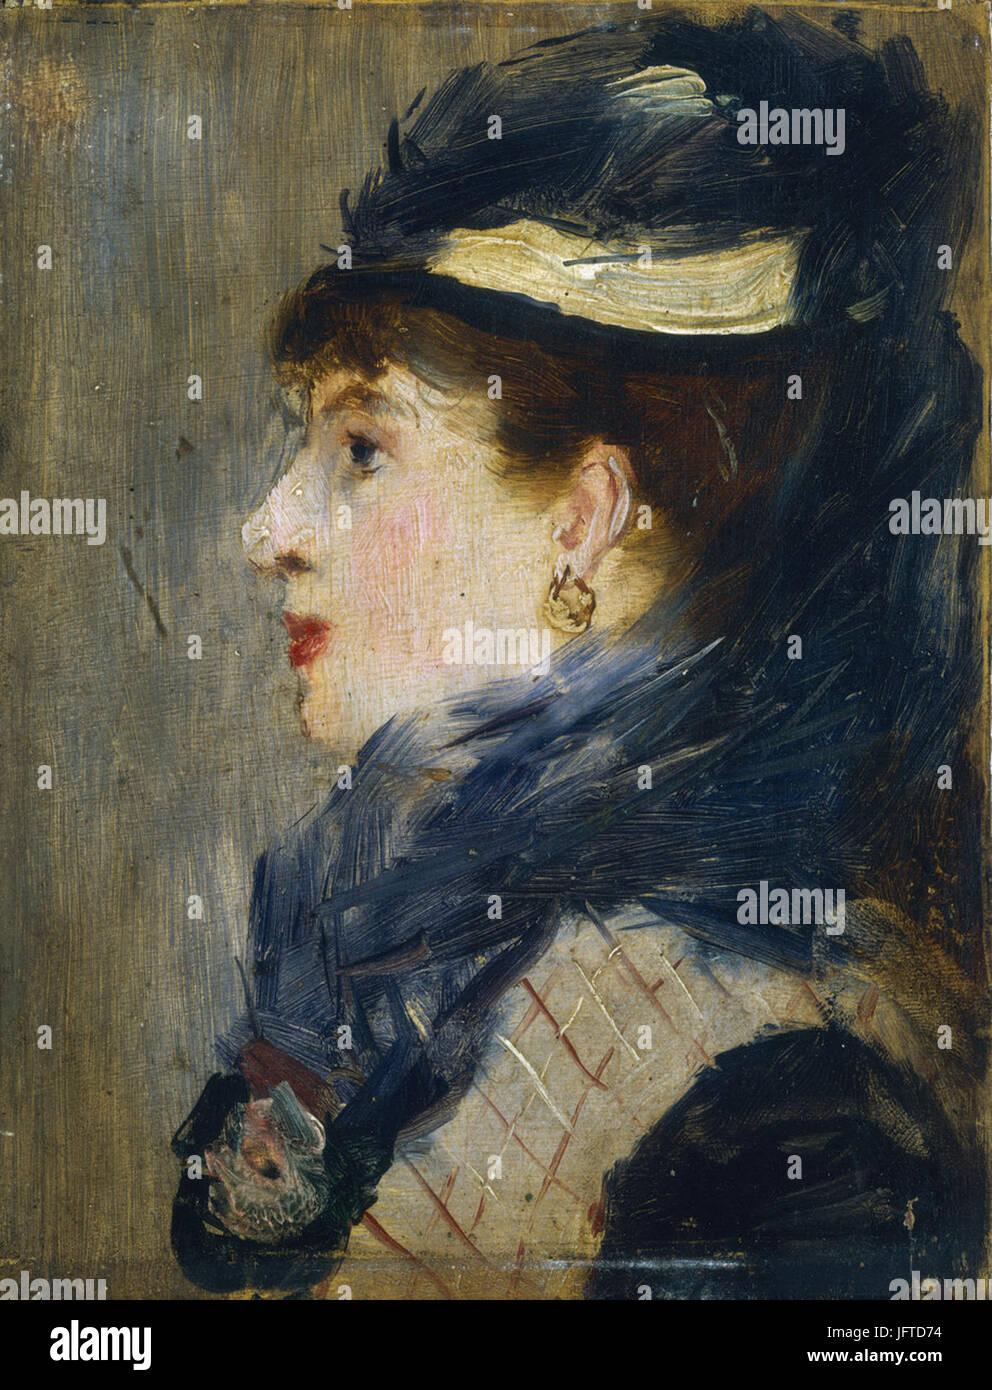 Édouard Manet - TơAAte de femme (RW 307) - Stock Image